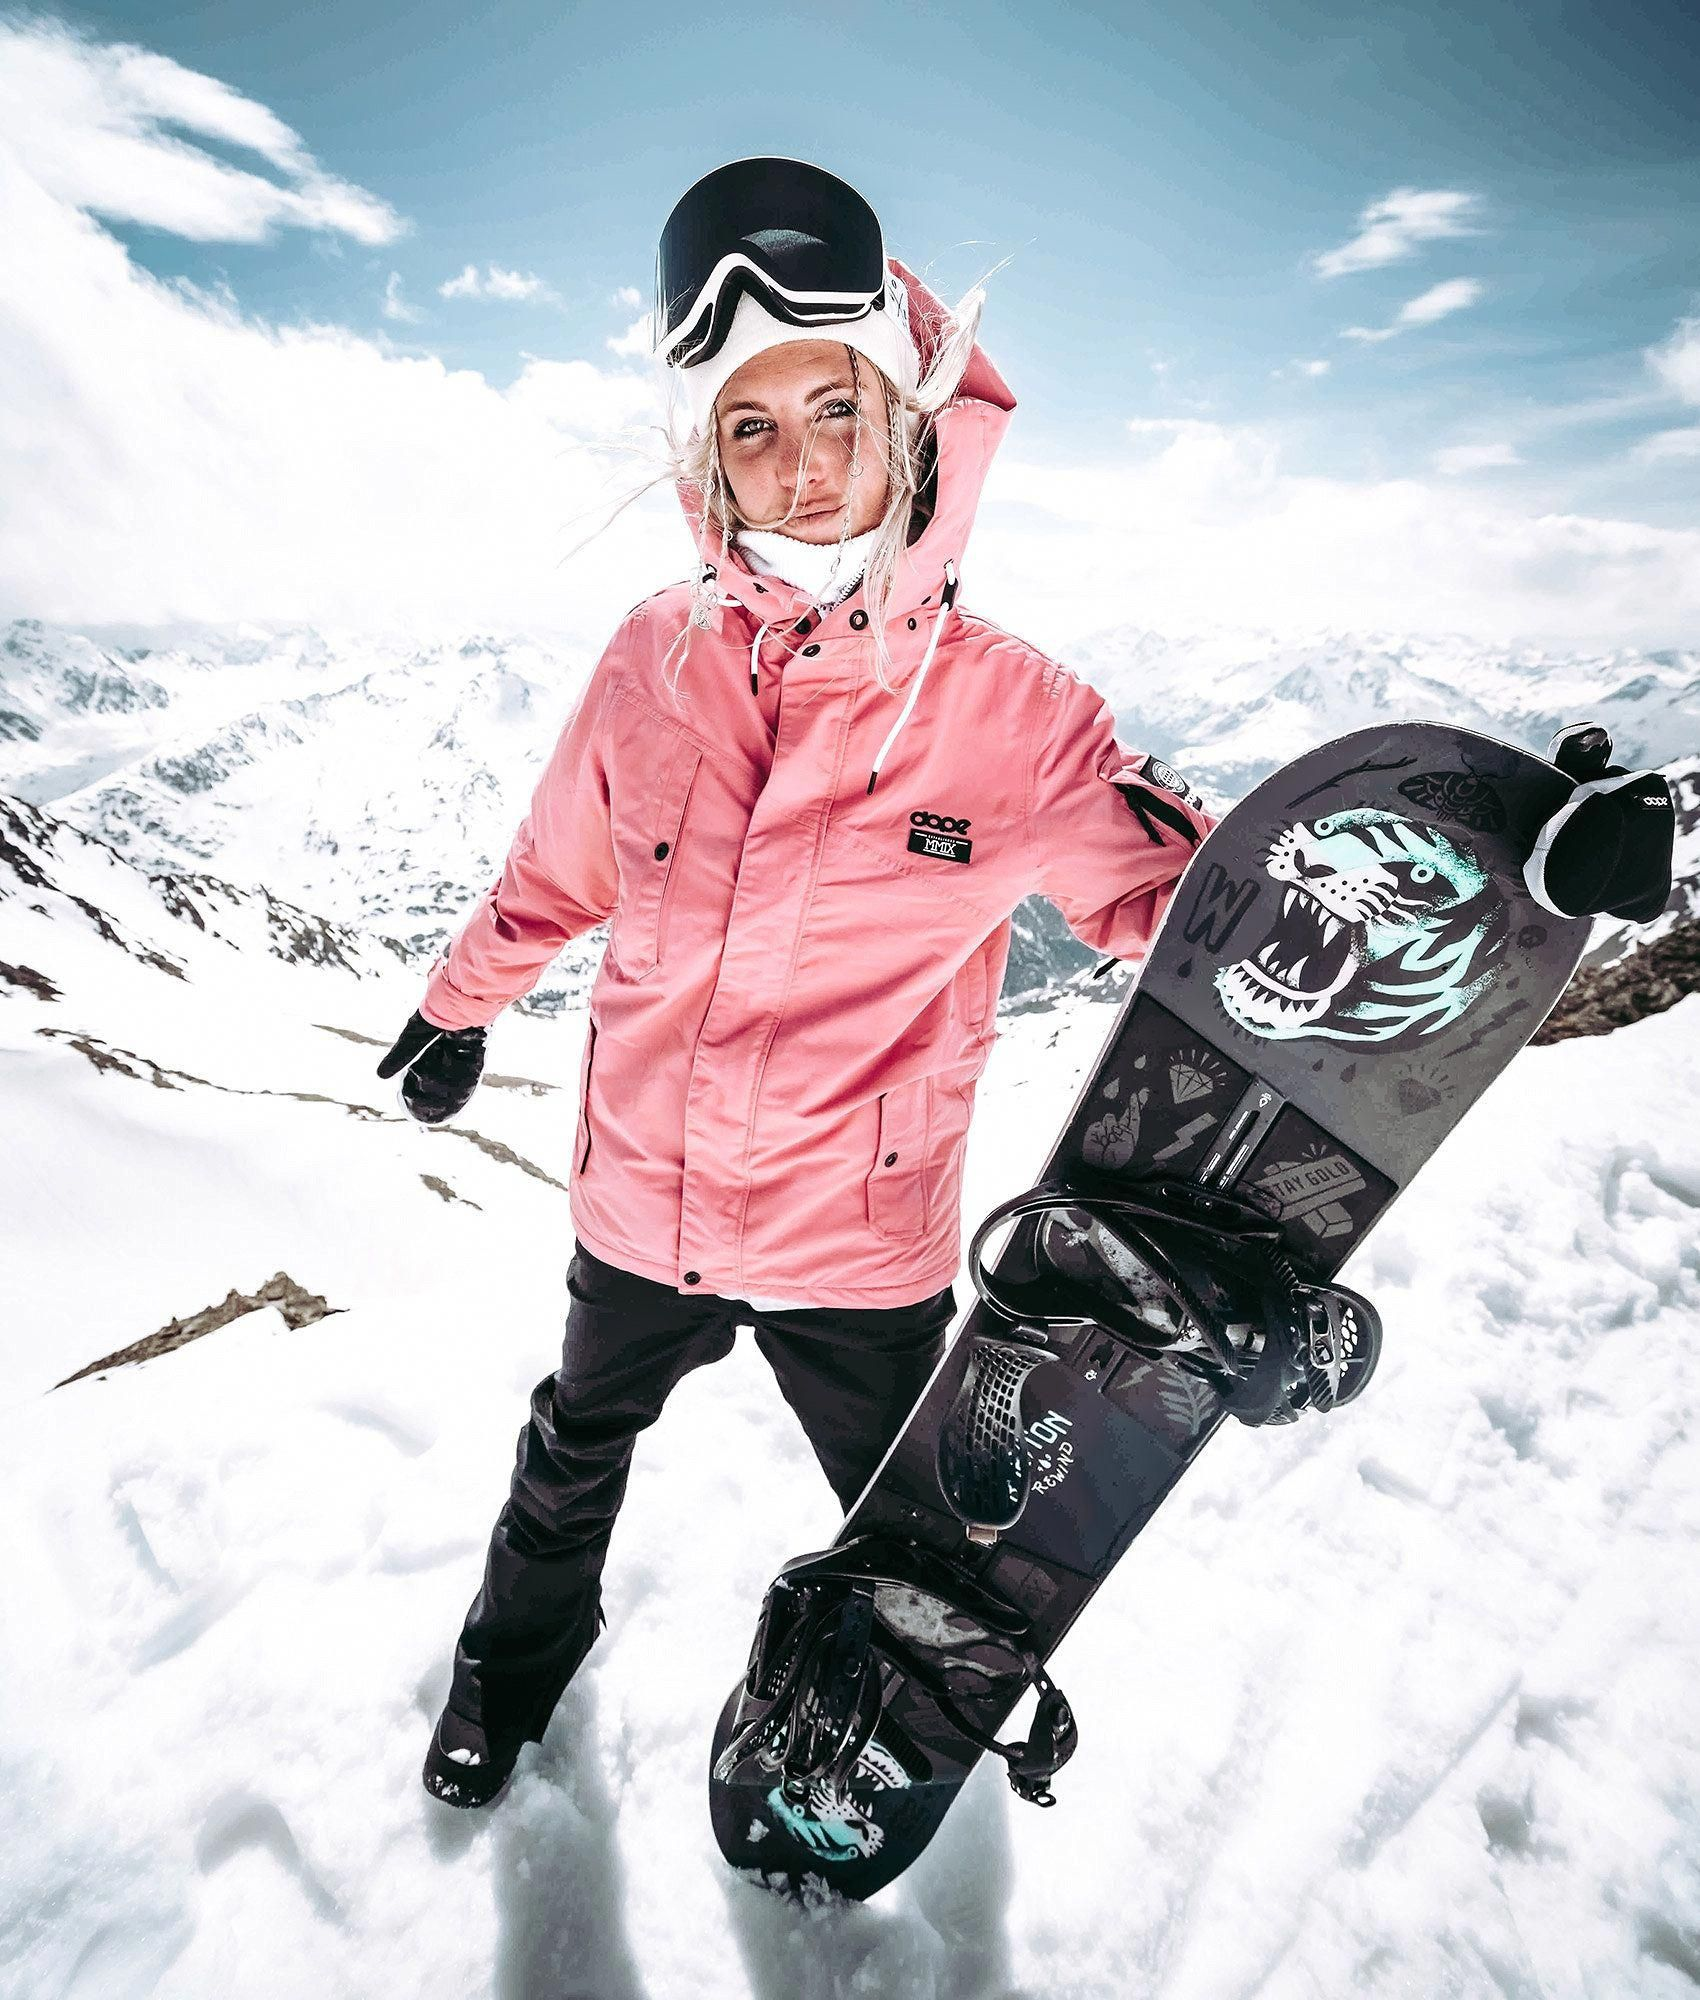 9326812de75d0 snowboarding gear womens snowboard outfit  Snow!!! Ropa Esqui